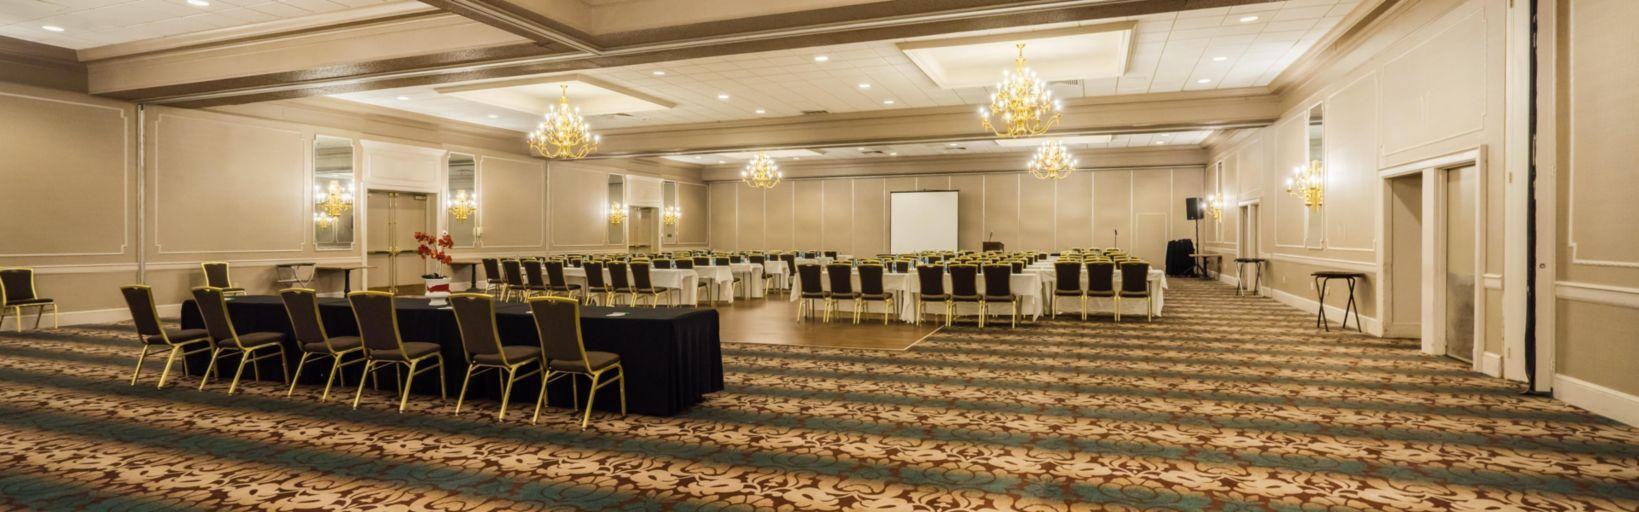 Ballroom At Holiday Inn Mansfield Foxboro